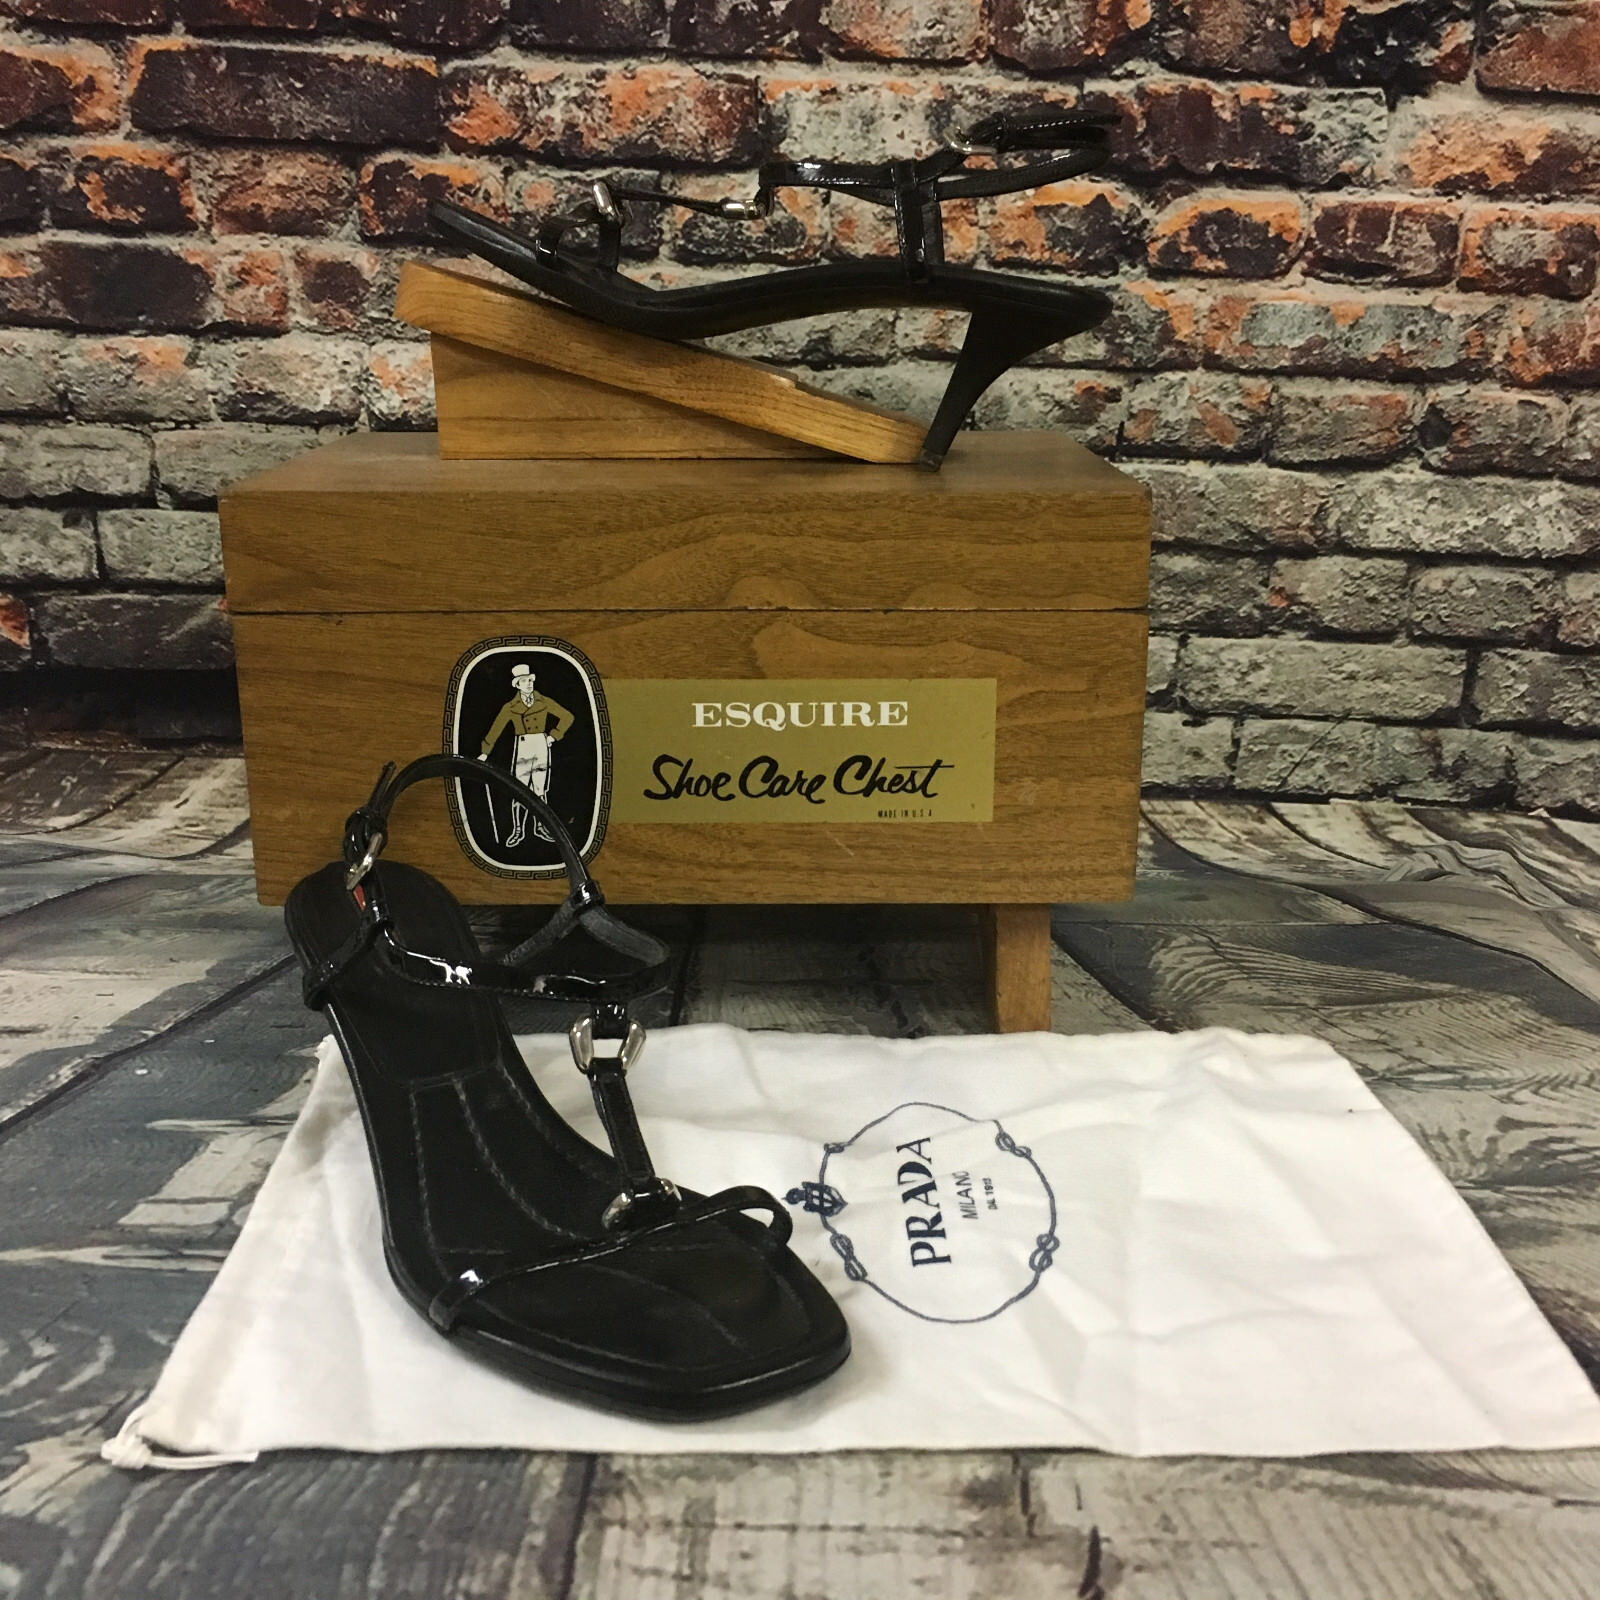 Prada High Heel Open Toe Sandal Shoes Sz 38 US 7.5 - Show Off Those Sexy Feet